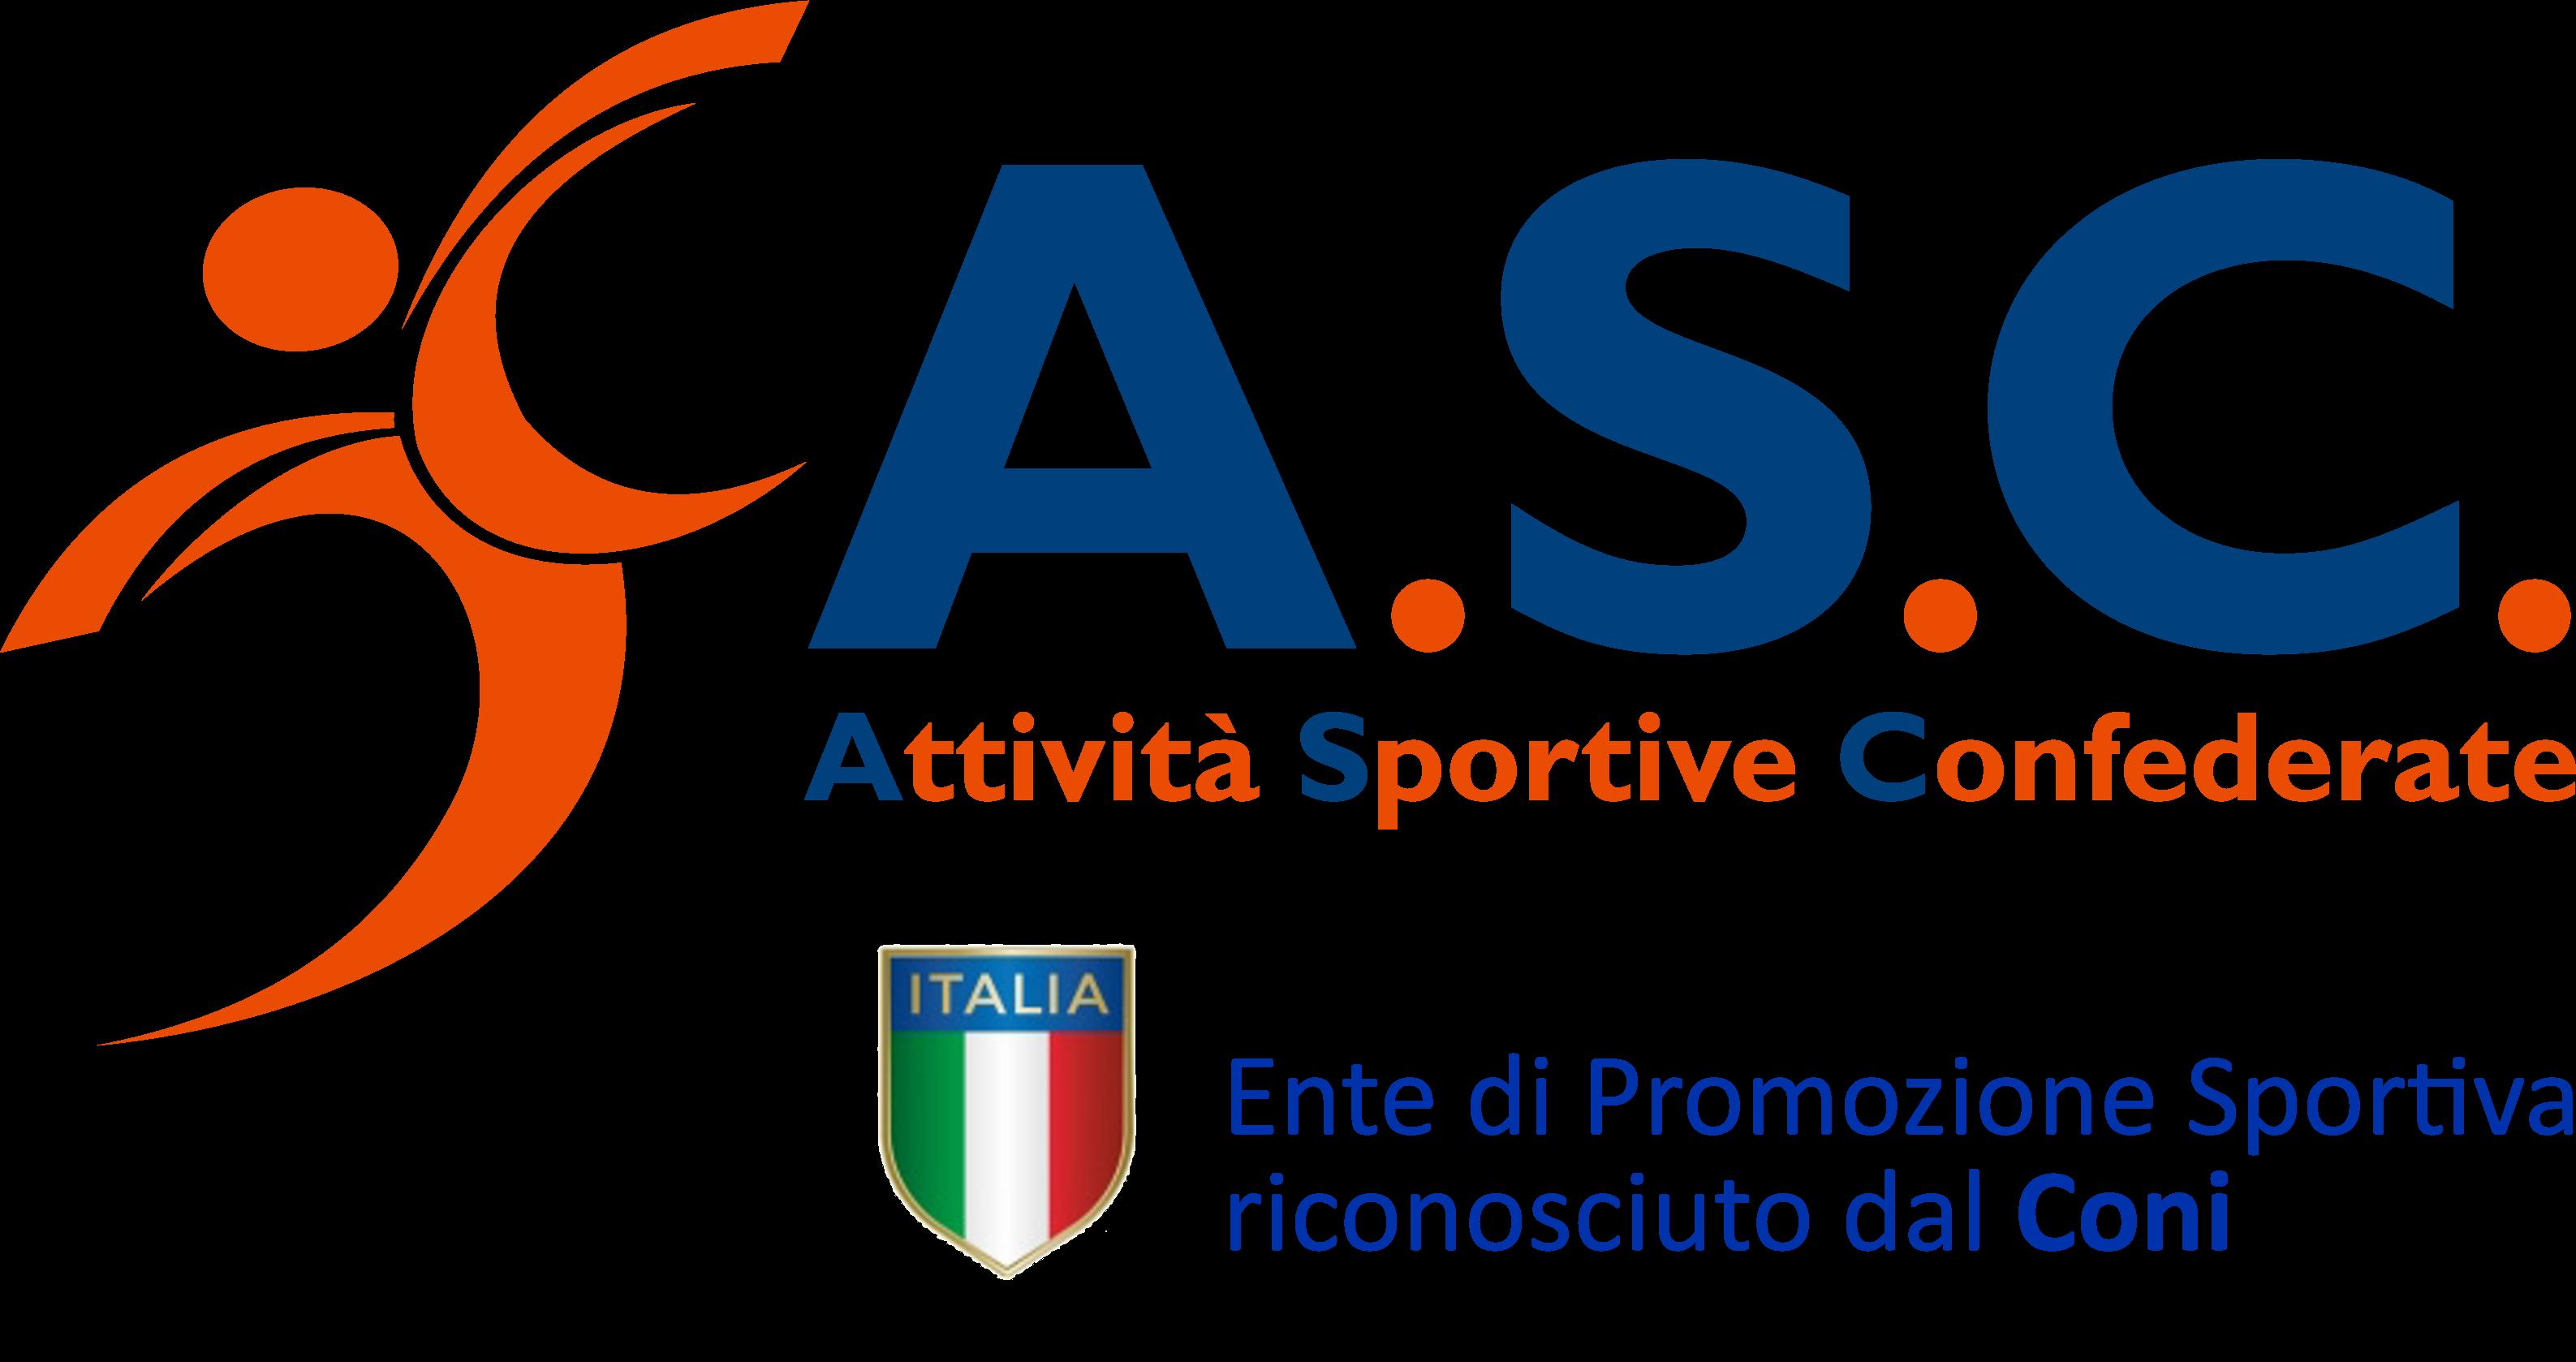 LogoAsc